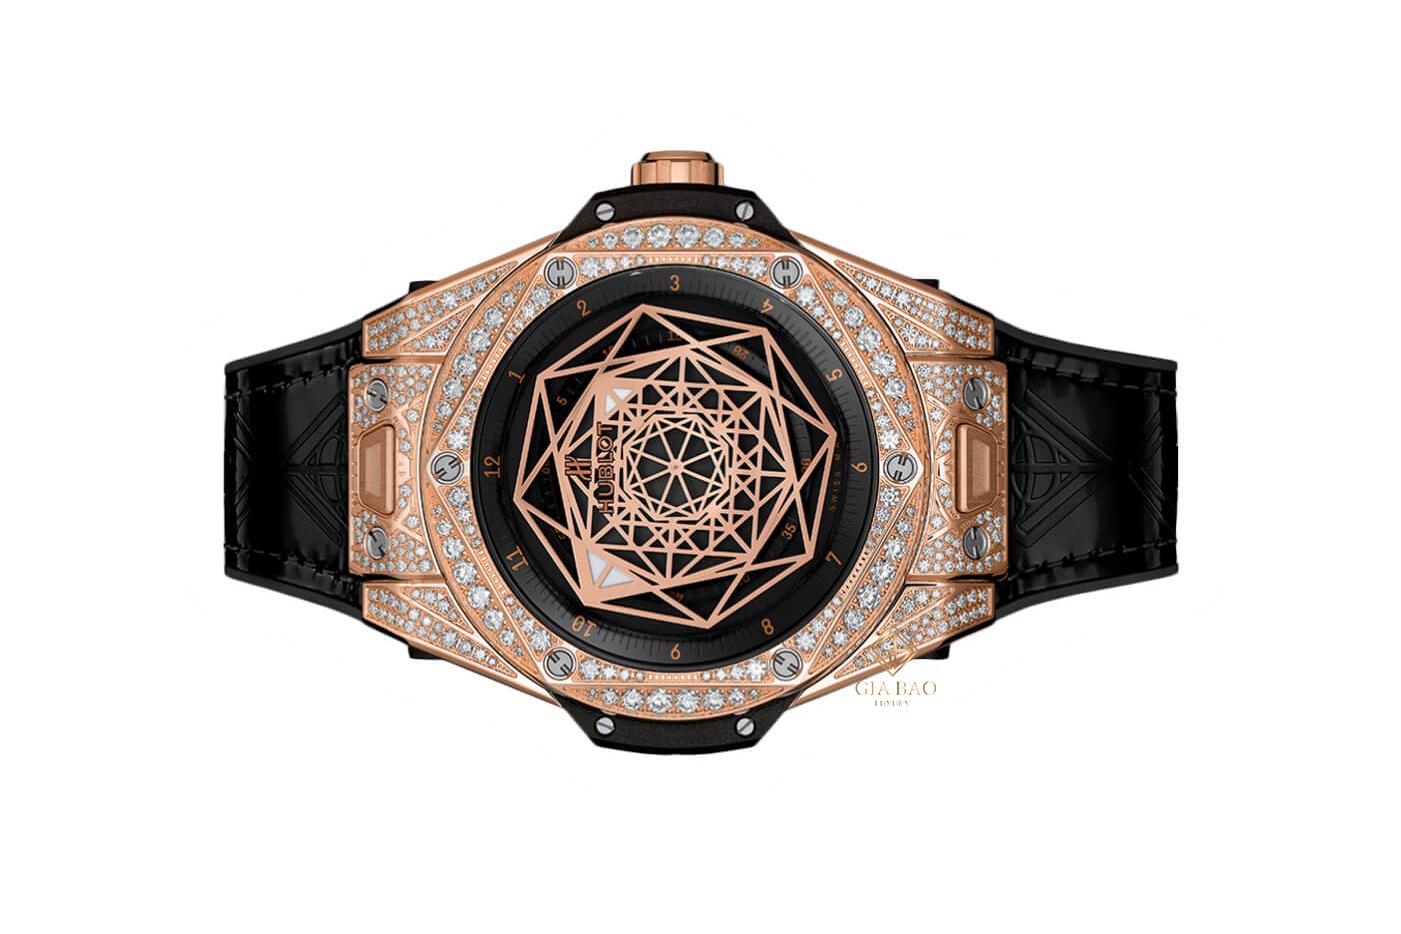 Đồng hồ hublot big bang one click